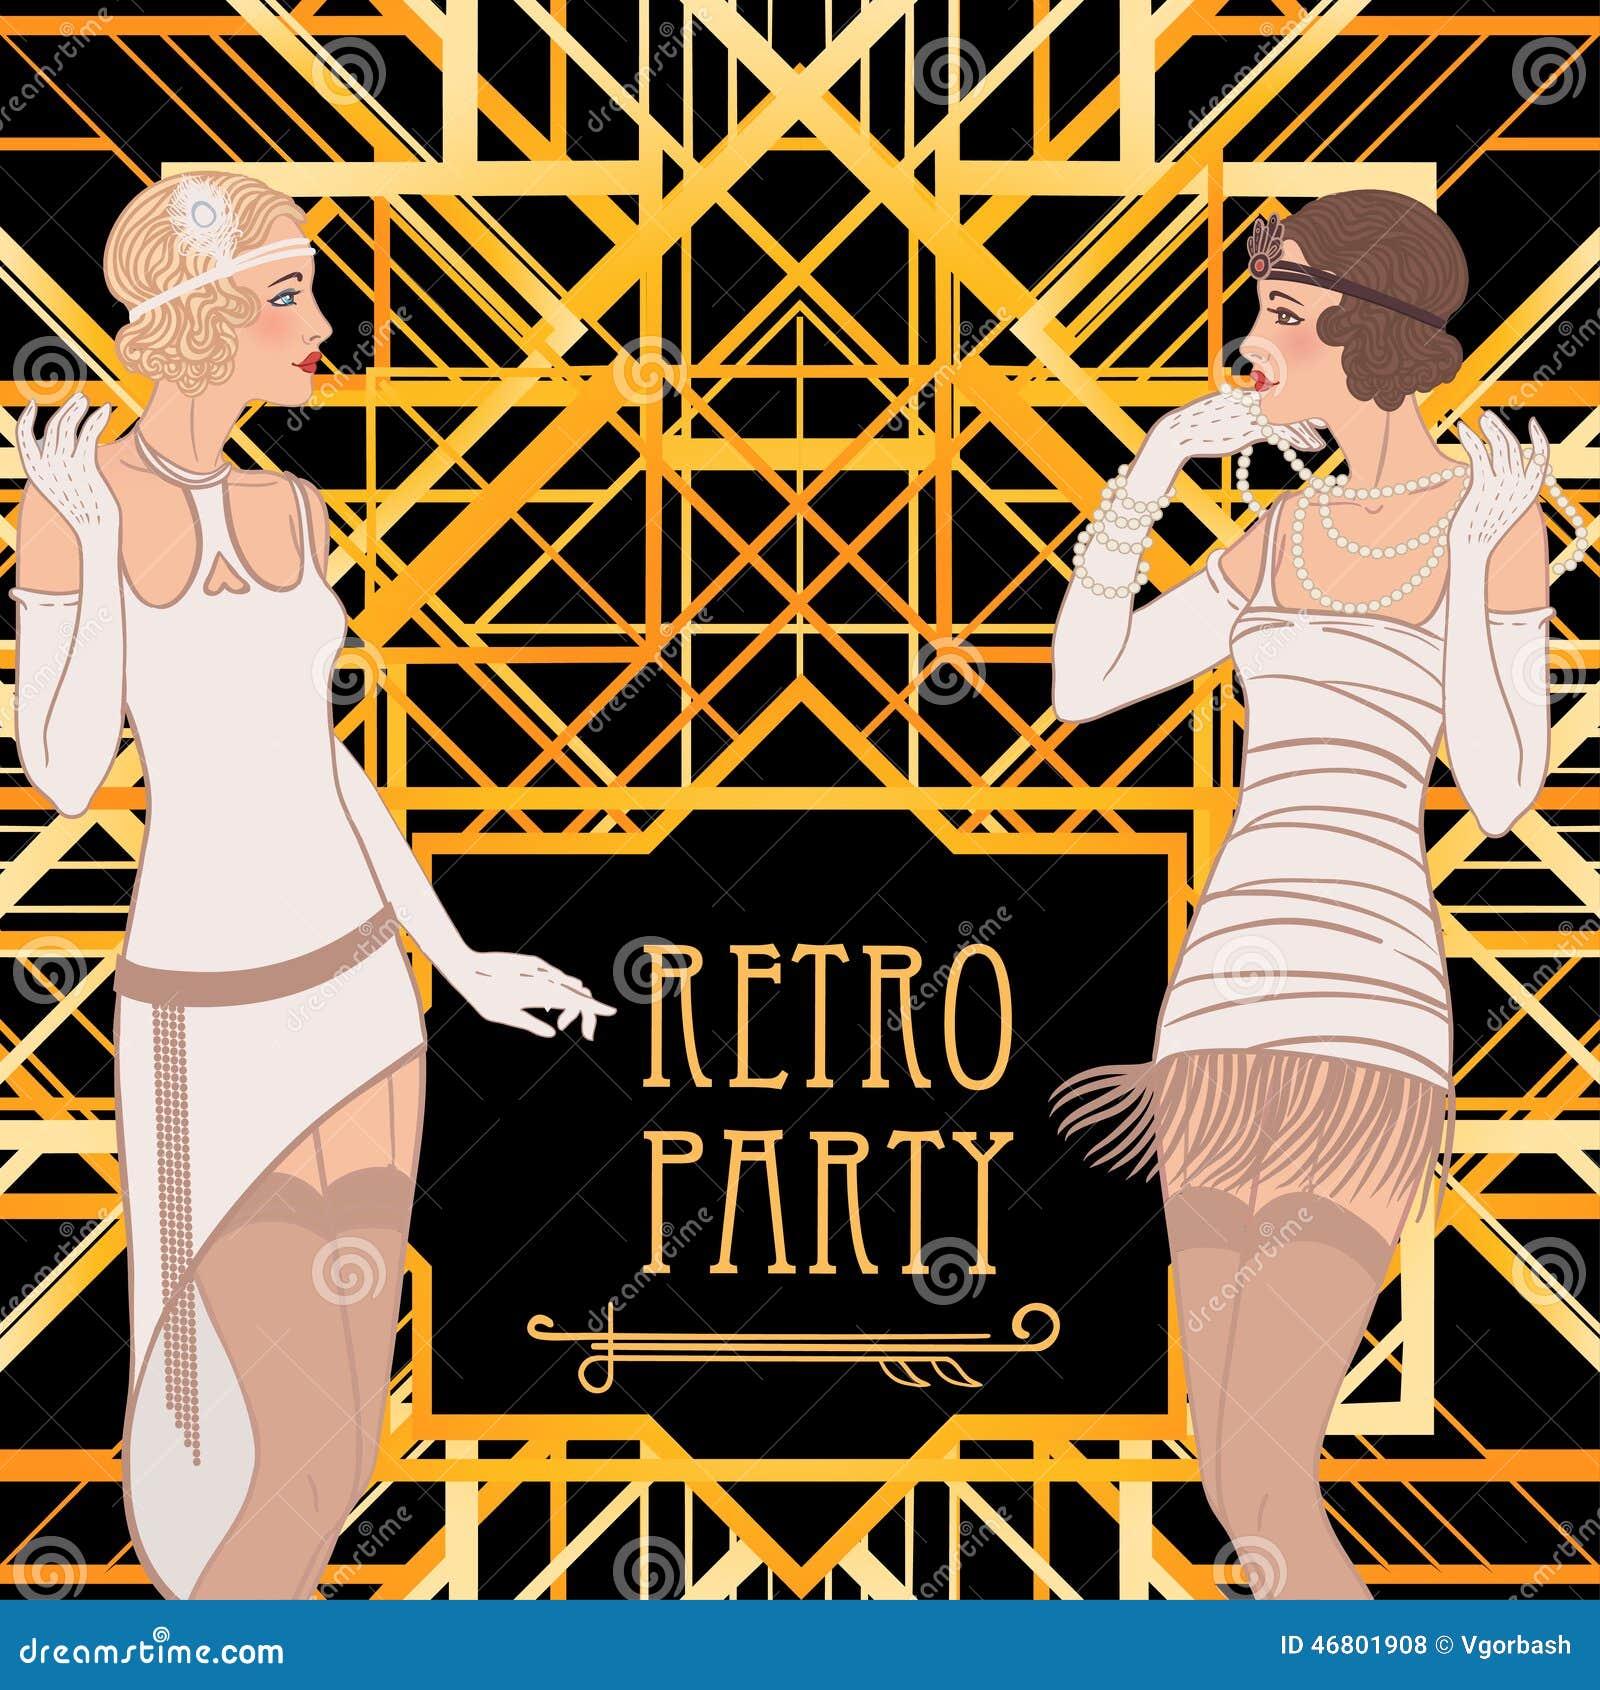 flapper girl retro party invitation design stock illustration